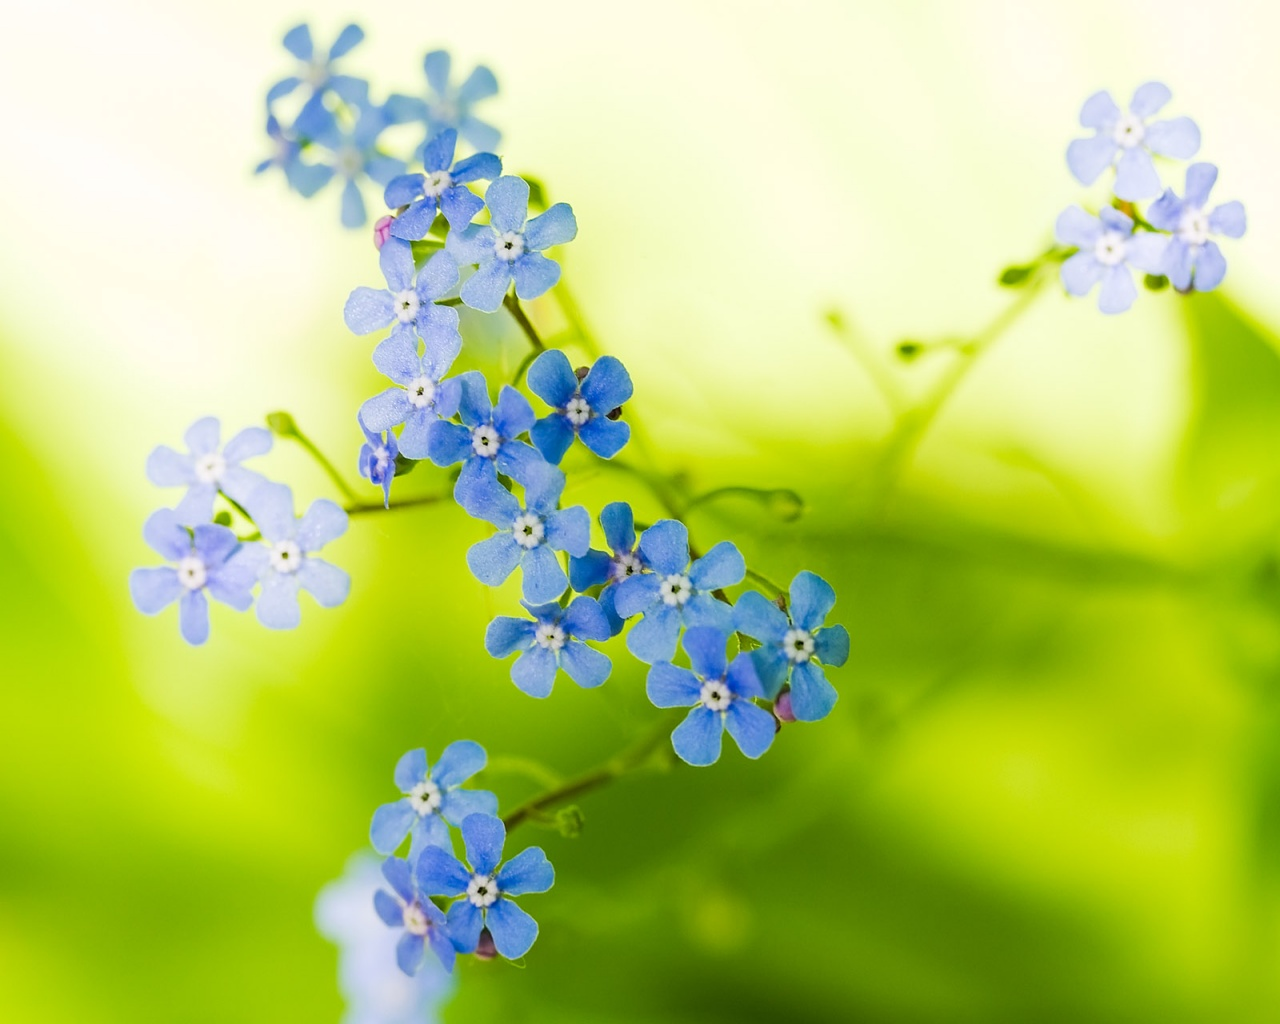 Green beautiful flowers wallpapers in jpg format for free download green beautiful flowers wallpapers izmirmasajfo